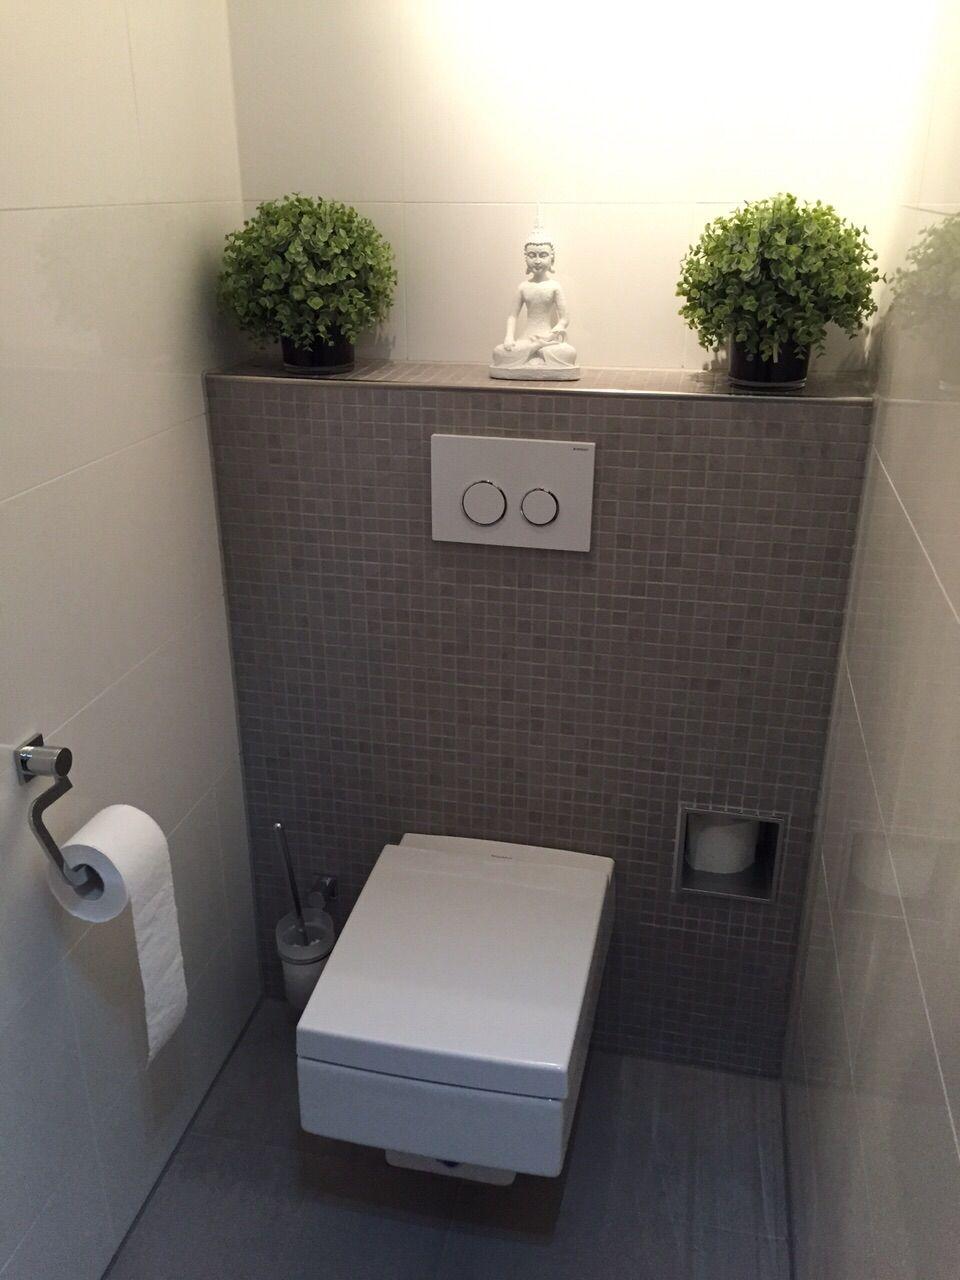 Mosa tegels | Toilet | Pinterest | Toilet, Bathroom inspiration and ...